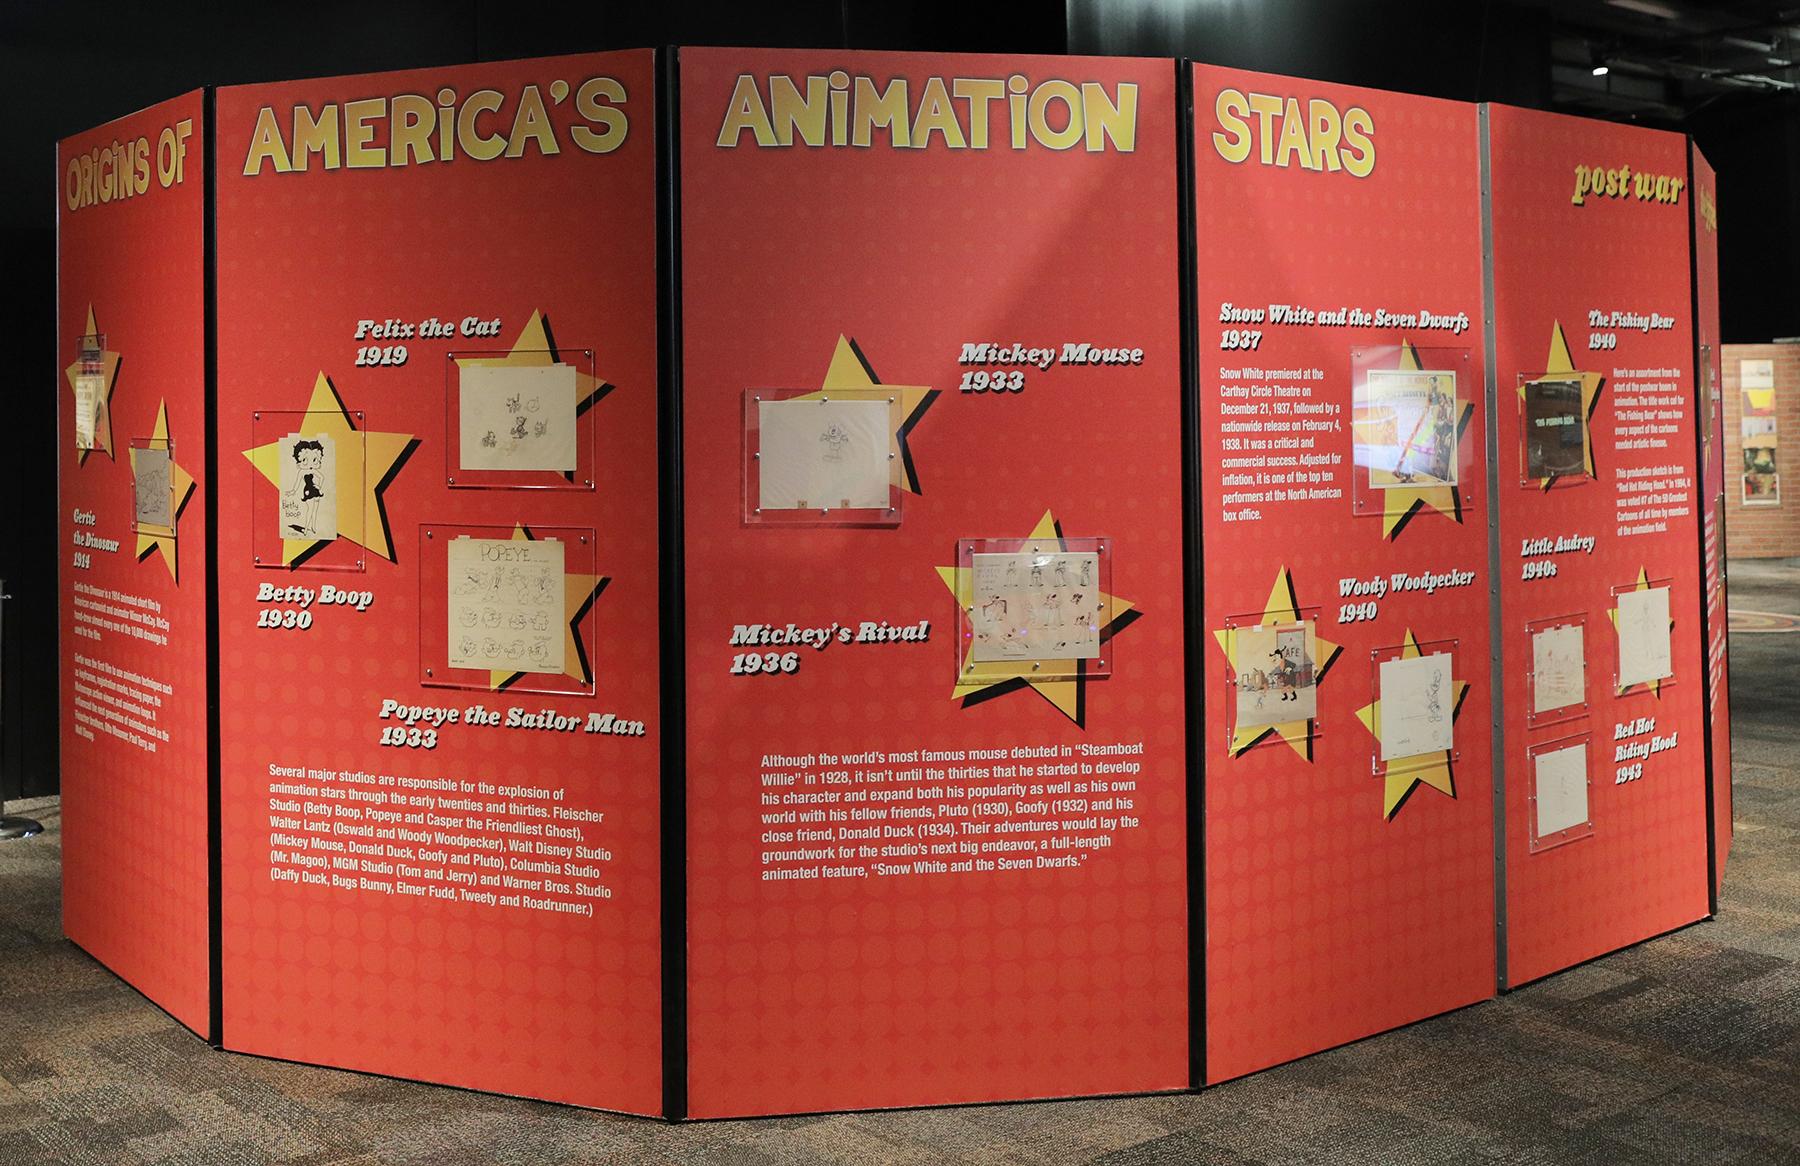 Origins of Americas Animation Stars walls.jpg